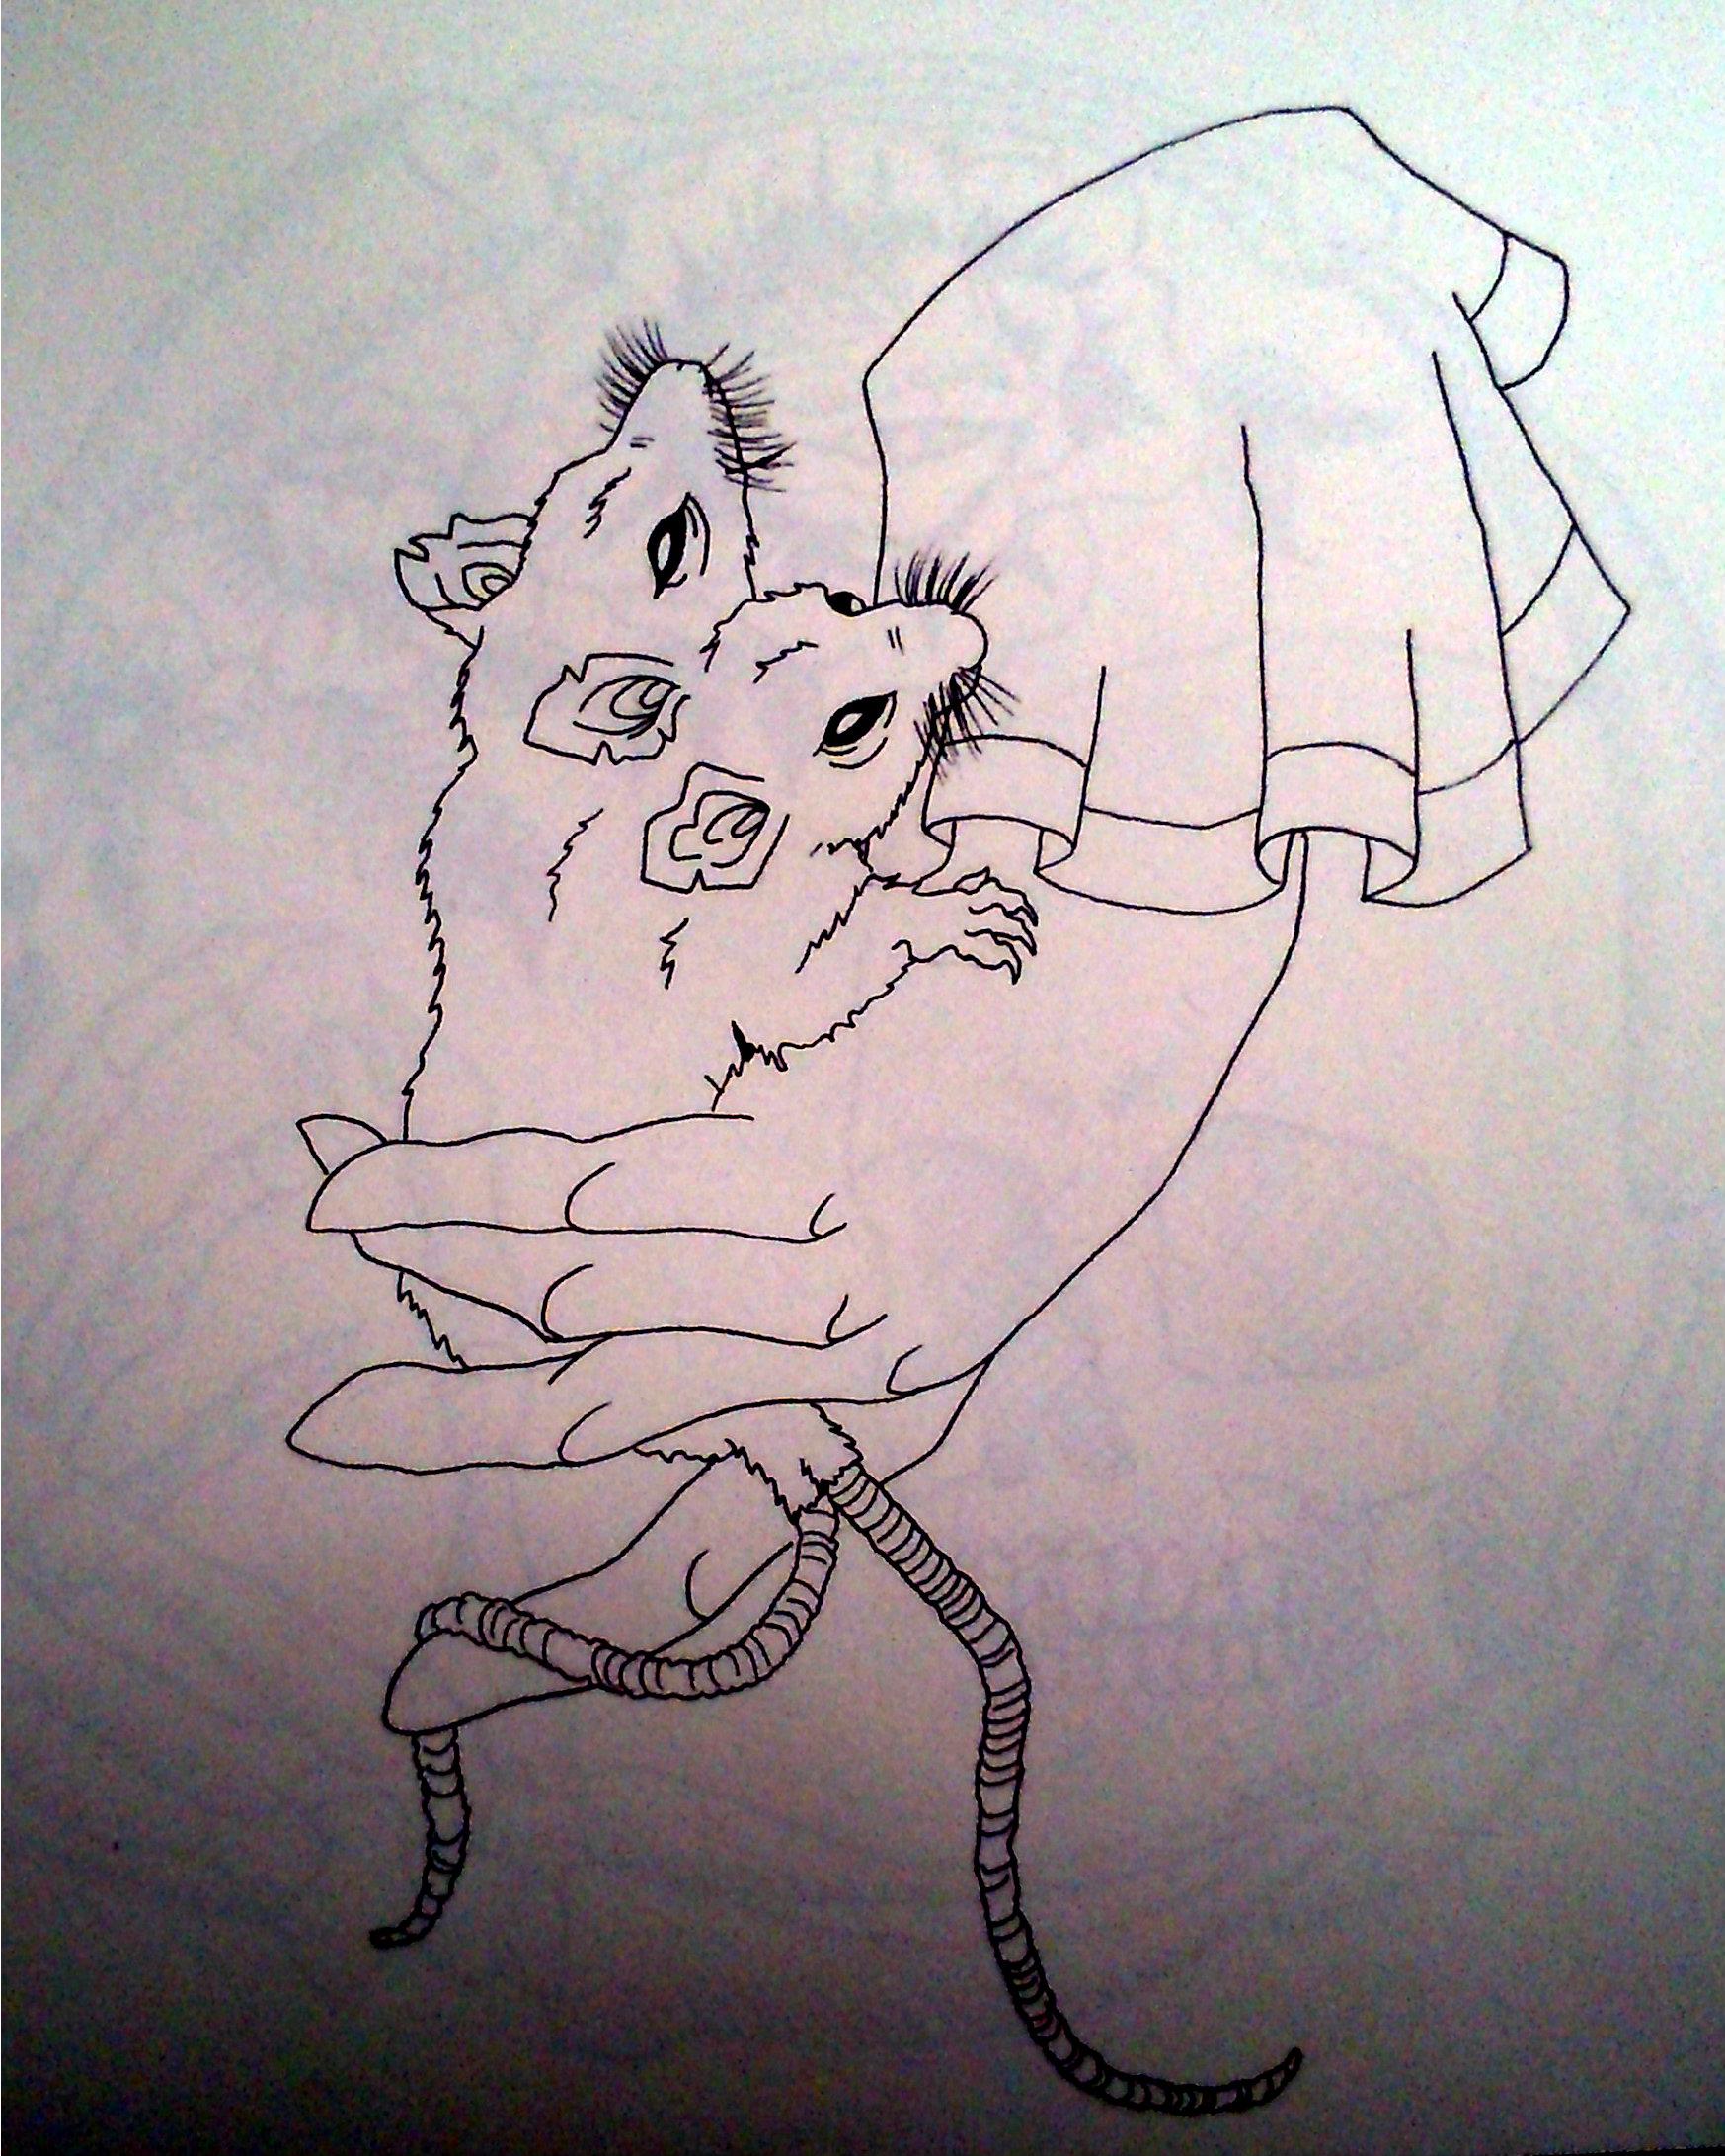 Drawn rat two Book Tattoo Headed Two Beresford